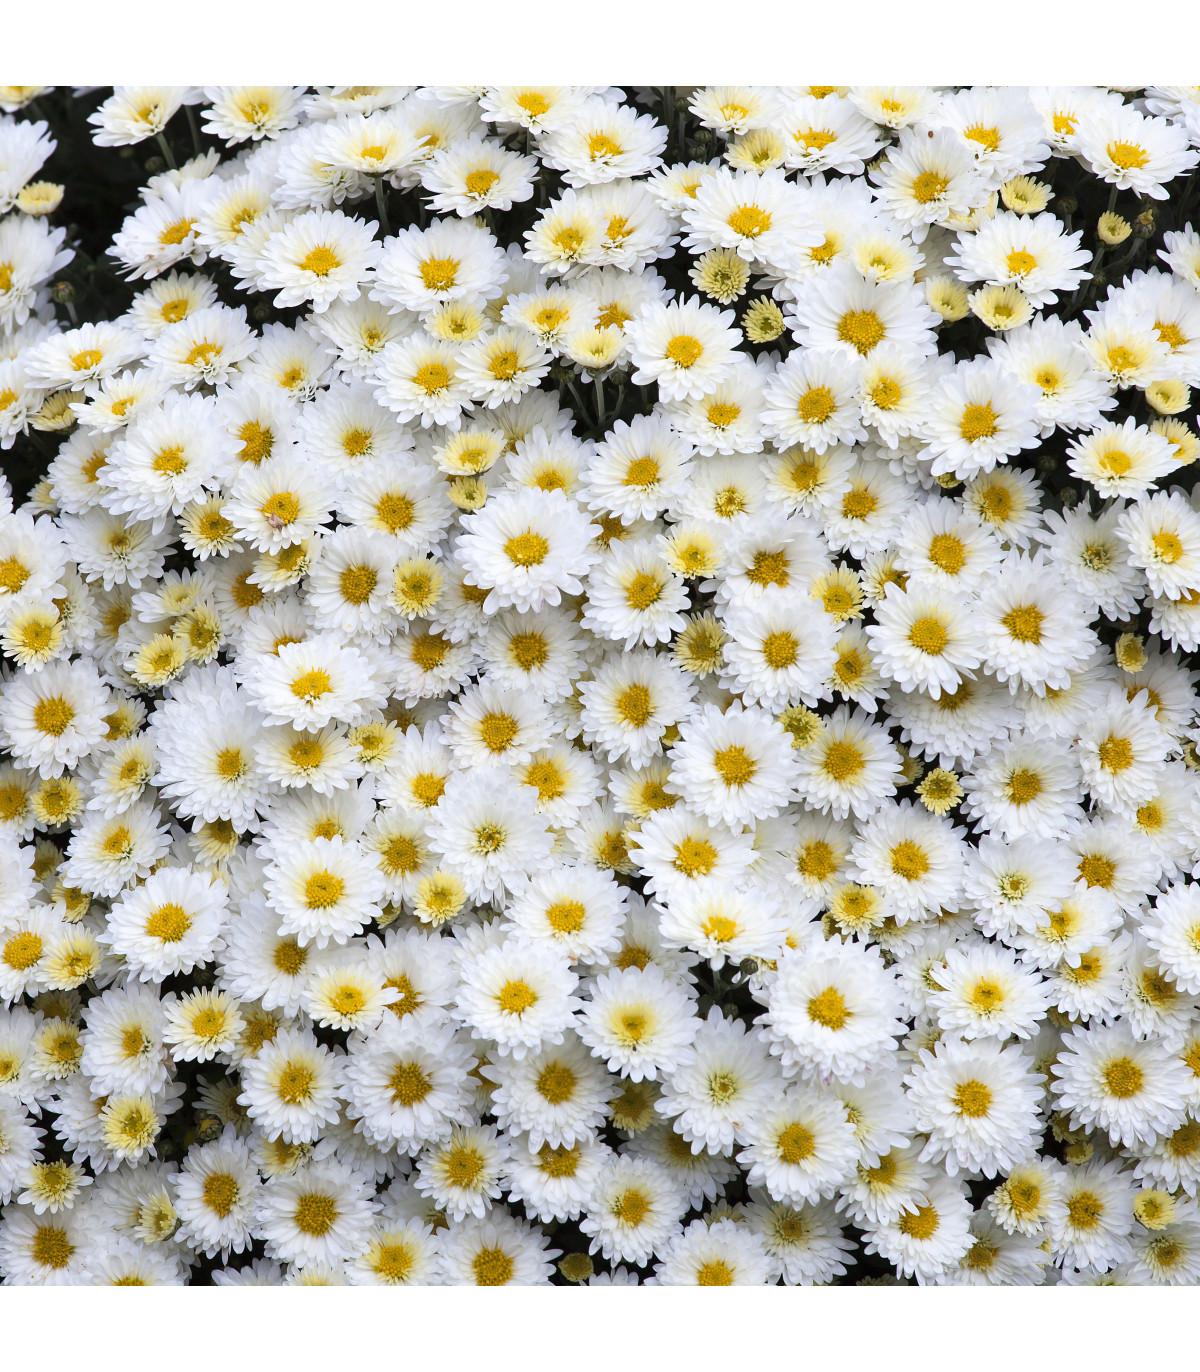 Margaréta biela Hviezda z Antverp - semená Margaréty - Chrysanthemum leucanthemum max.- 0,4 gr